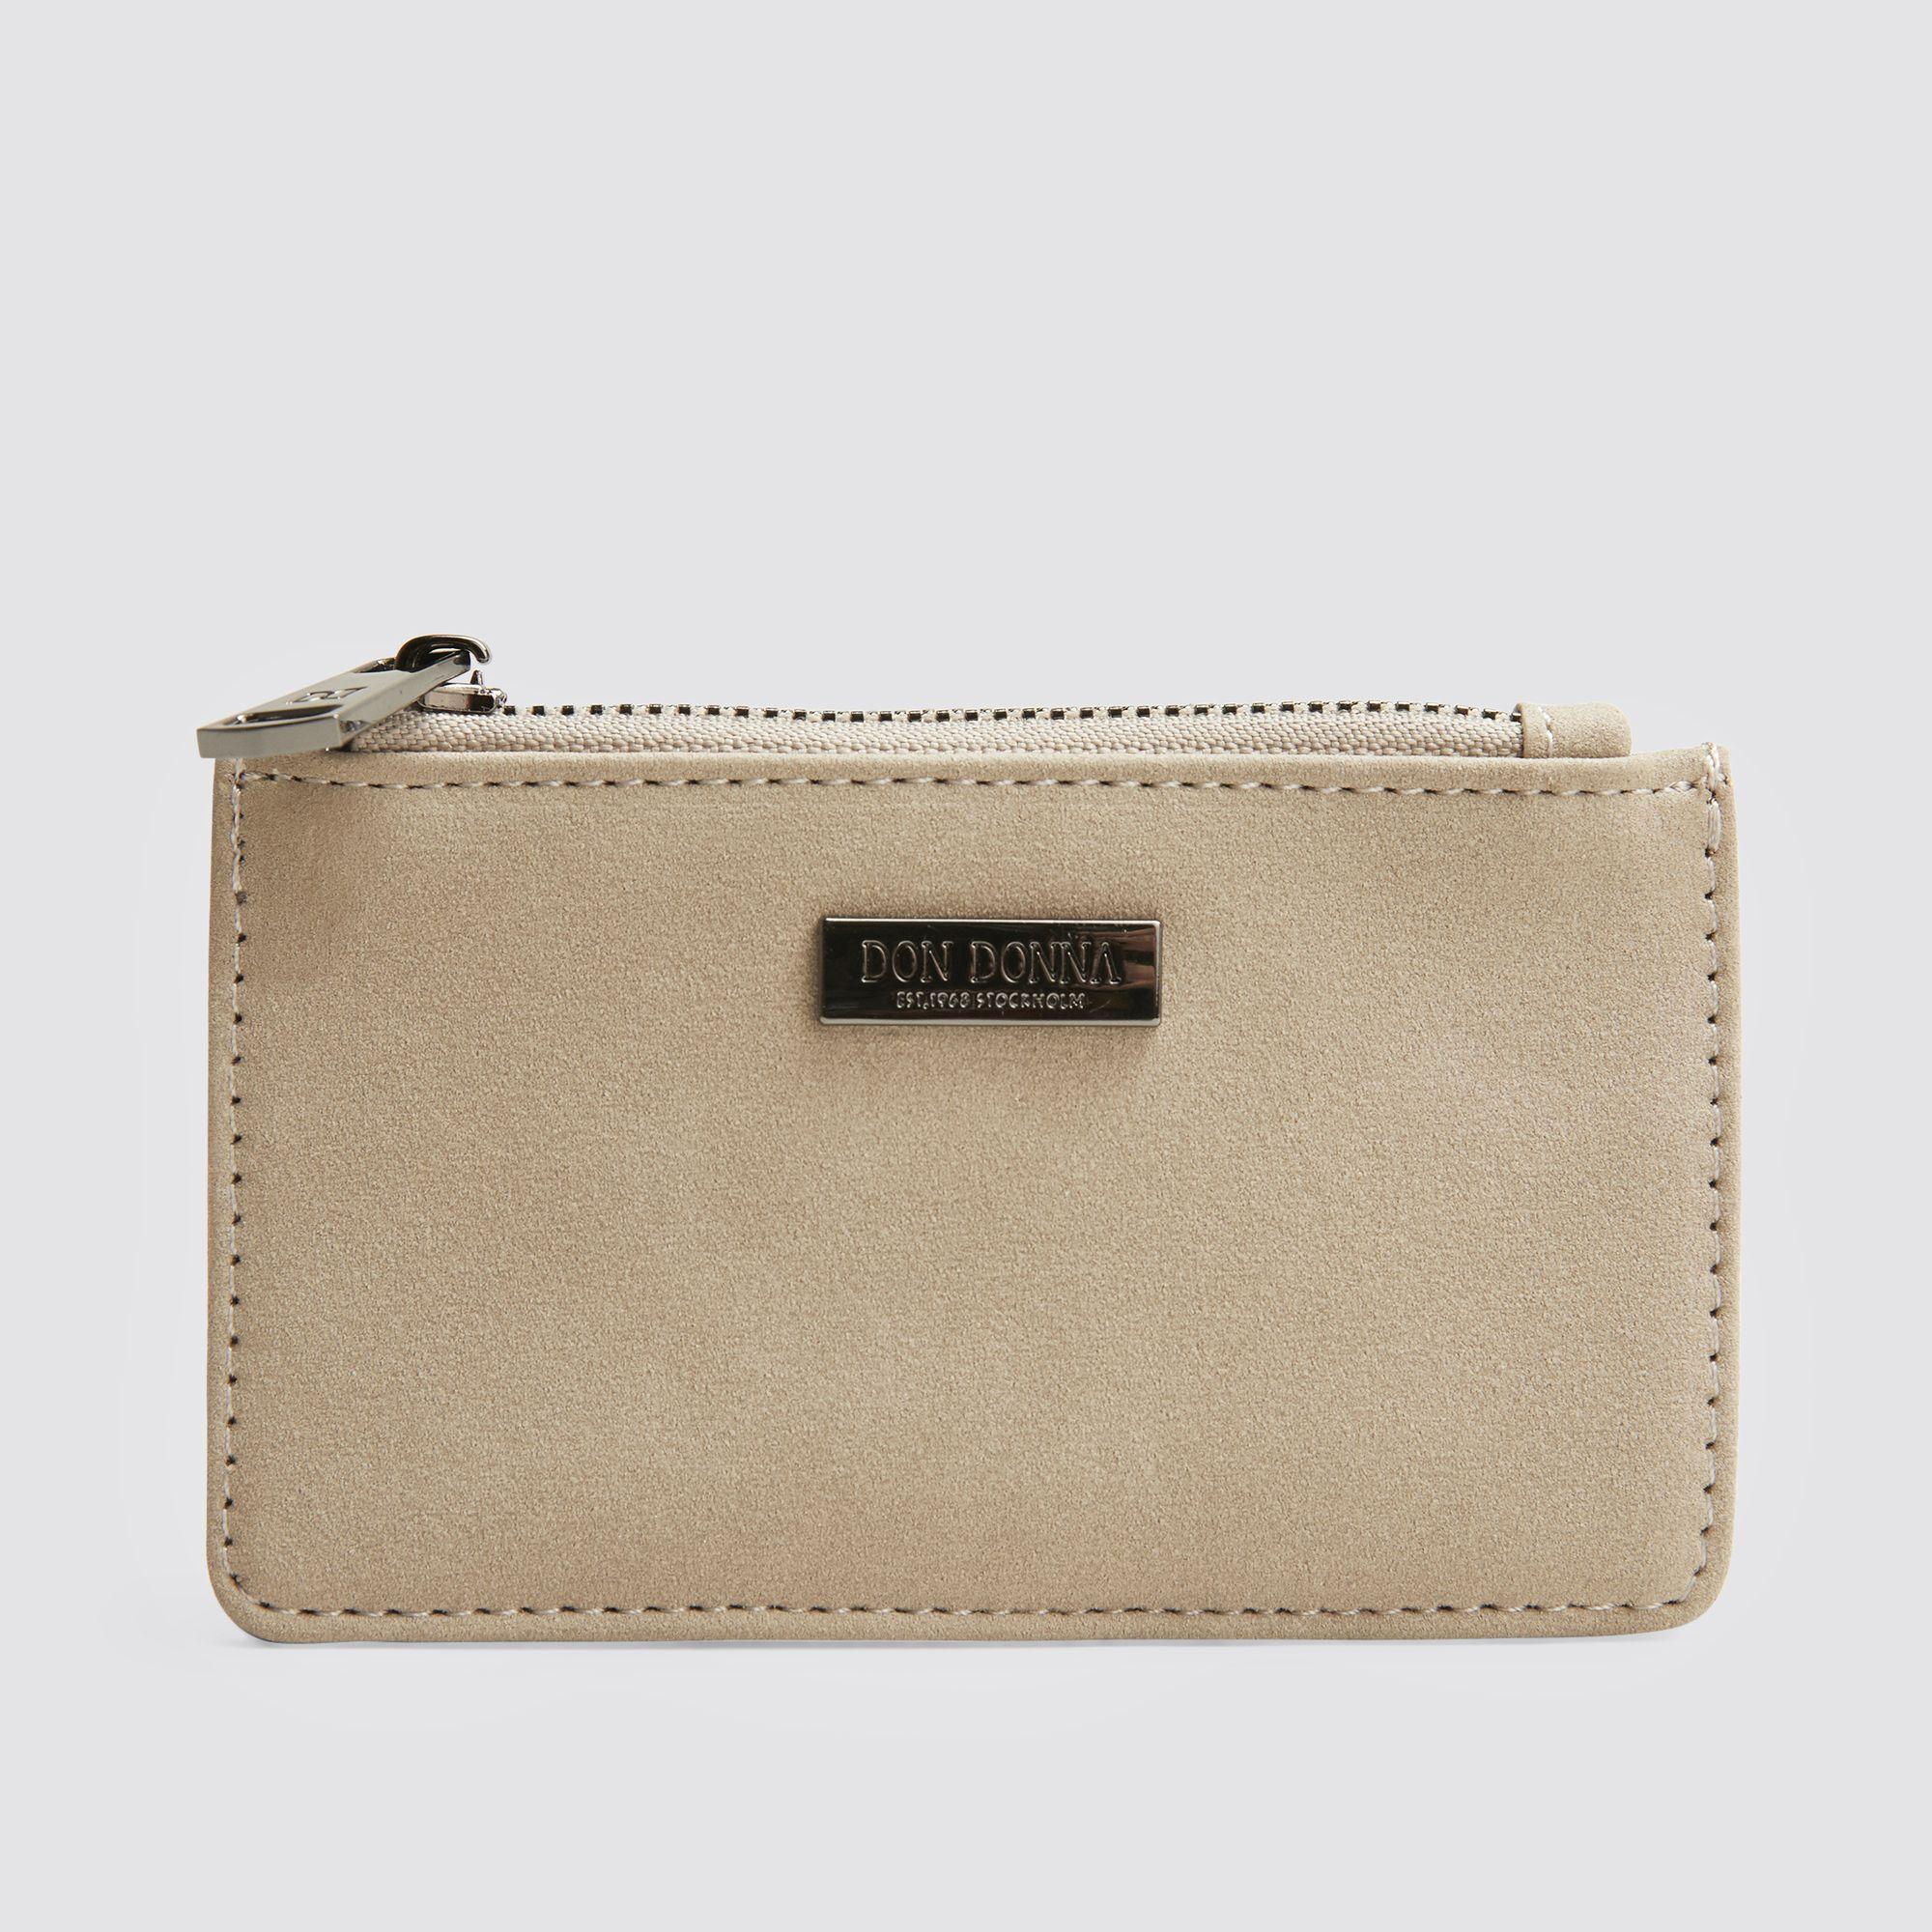 Don Donna Josefine plånbok, Svart billigt online | Axelväskor.se